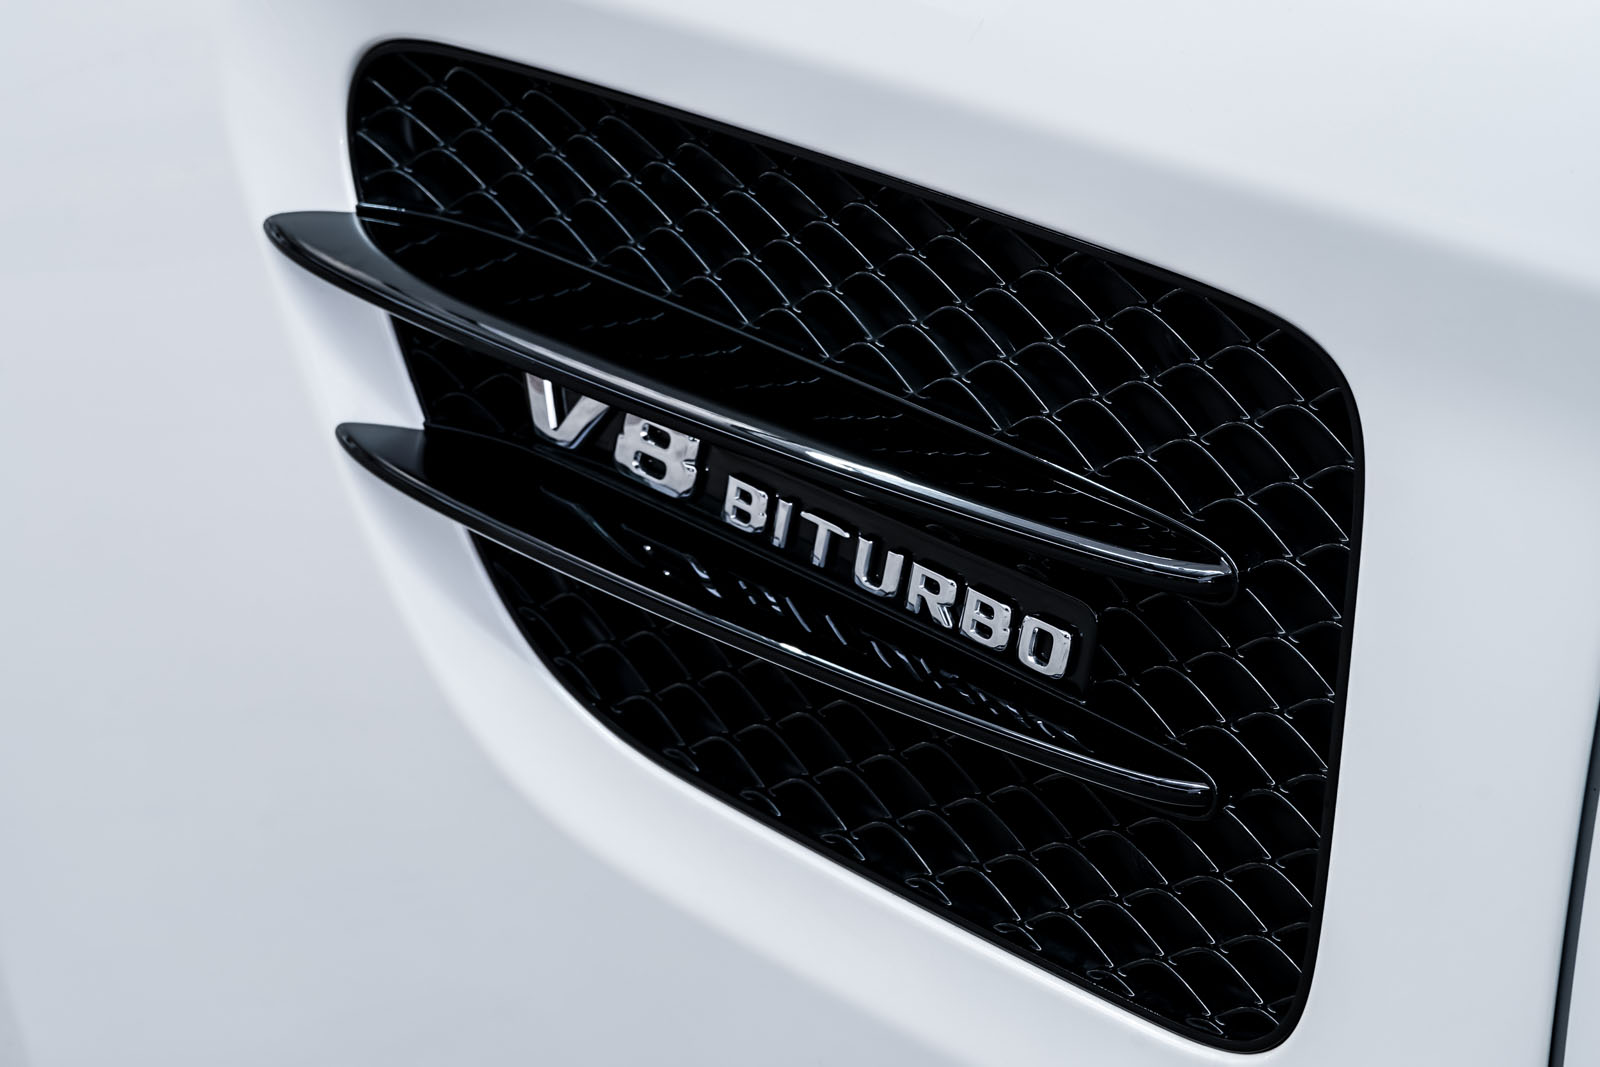 11Mercedes_Benz_AMG_GT_Roadster_Weiss_Schwarz_MB-9710_13_w